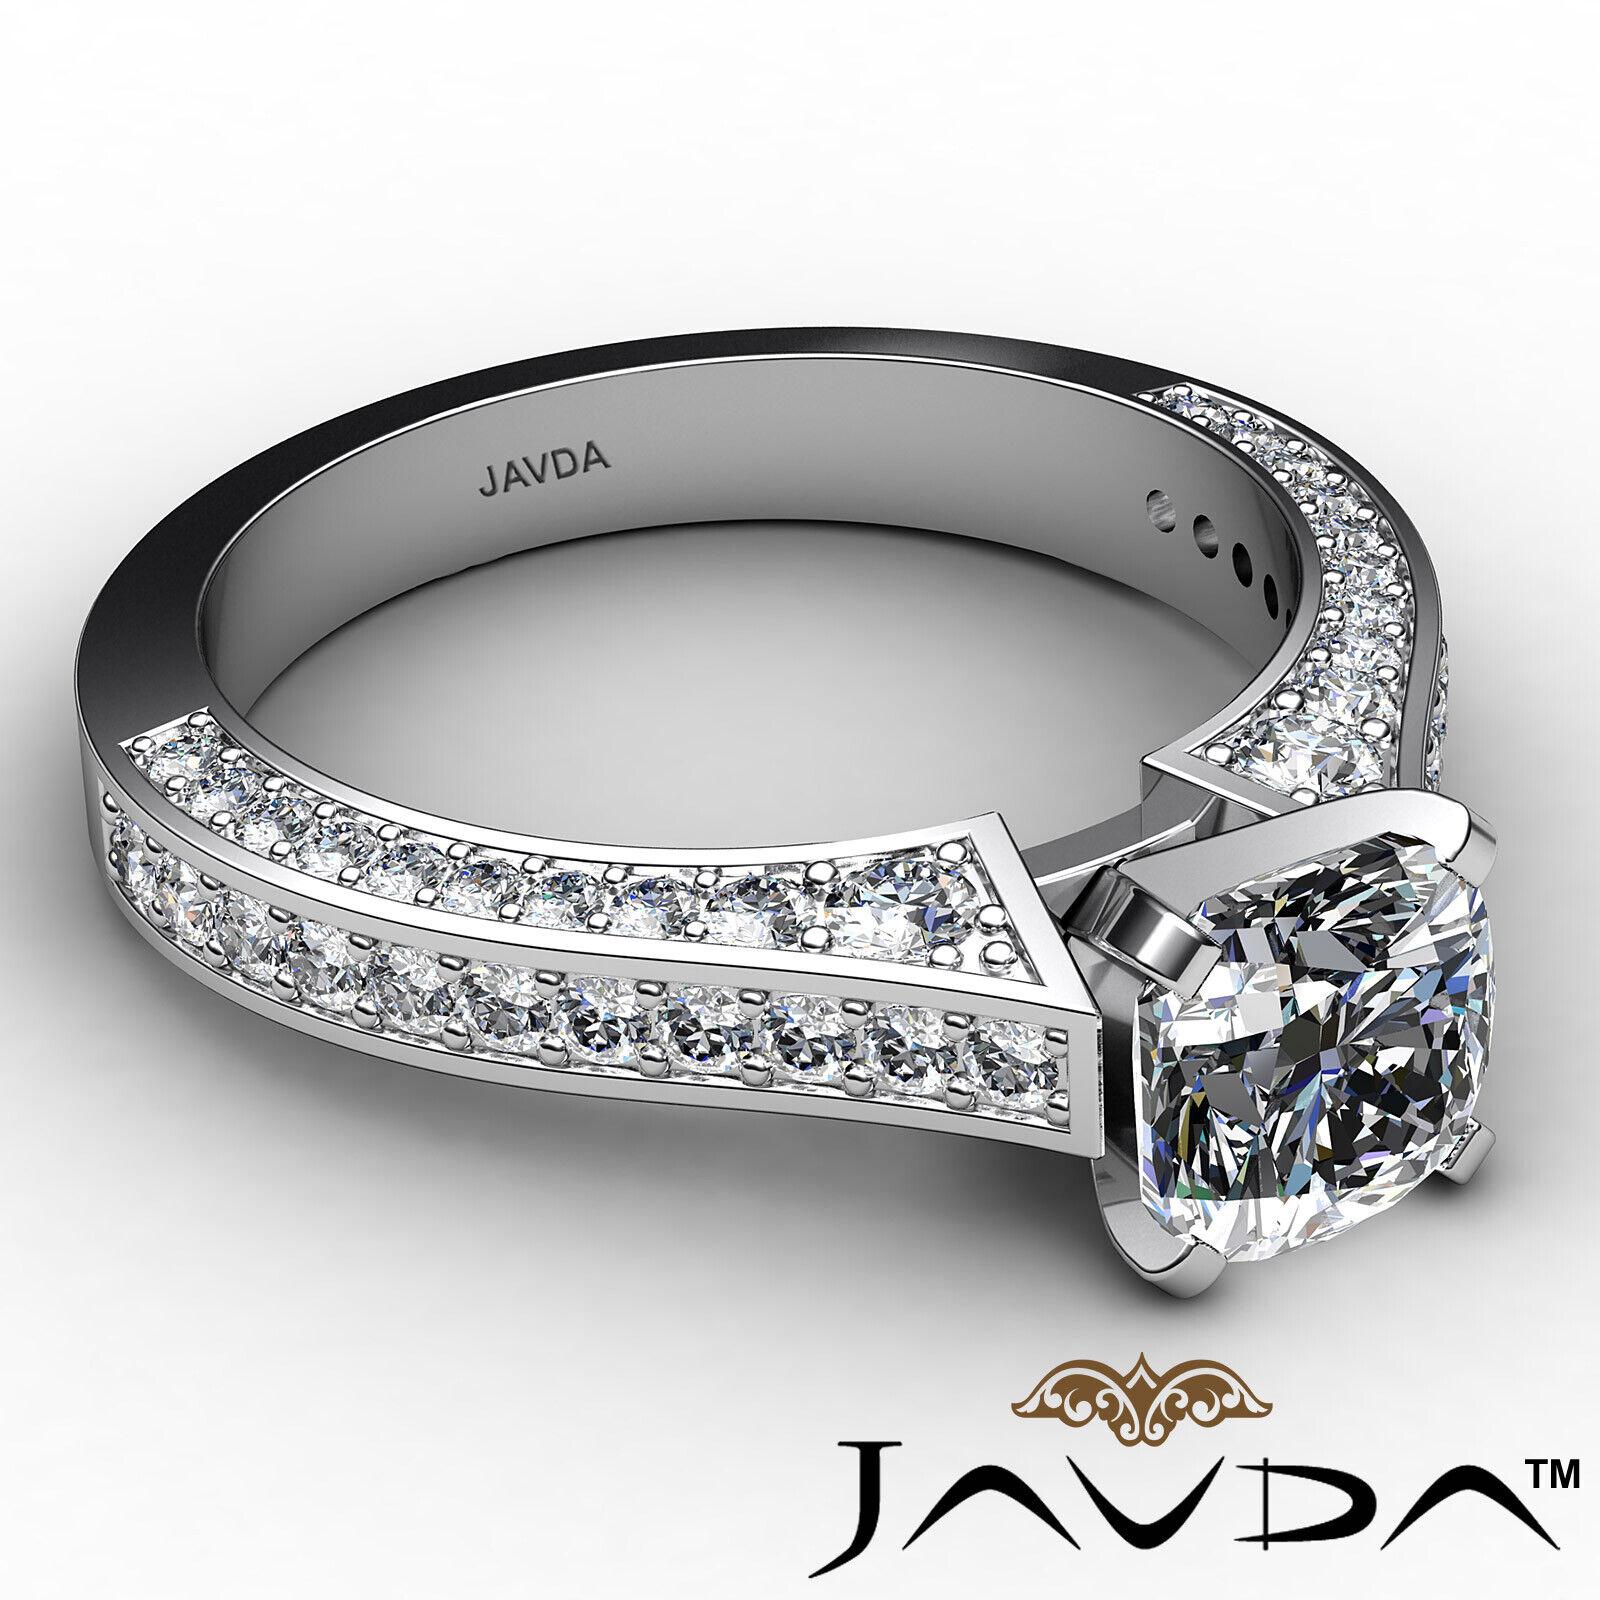 Cushion Diamond Engagement Pave Set Ring GIA J Color & VS2 clarity 1.82ctw 6